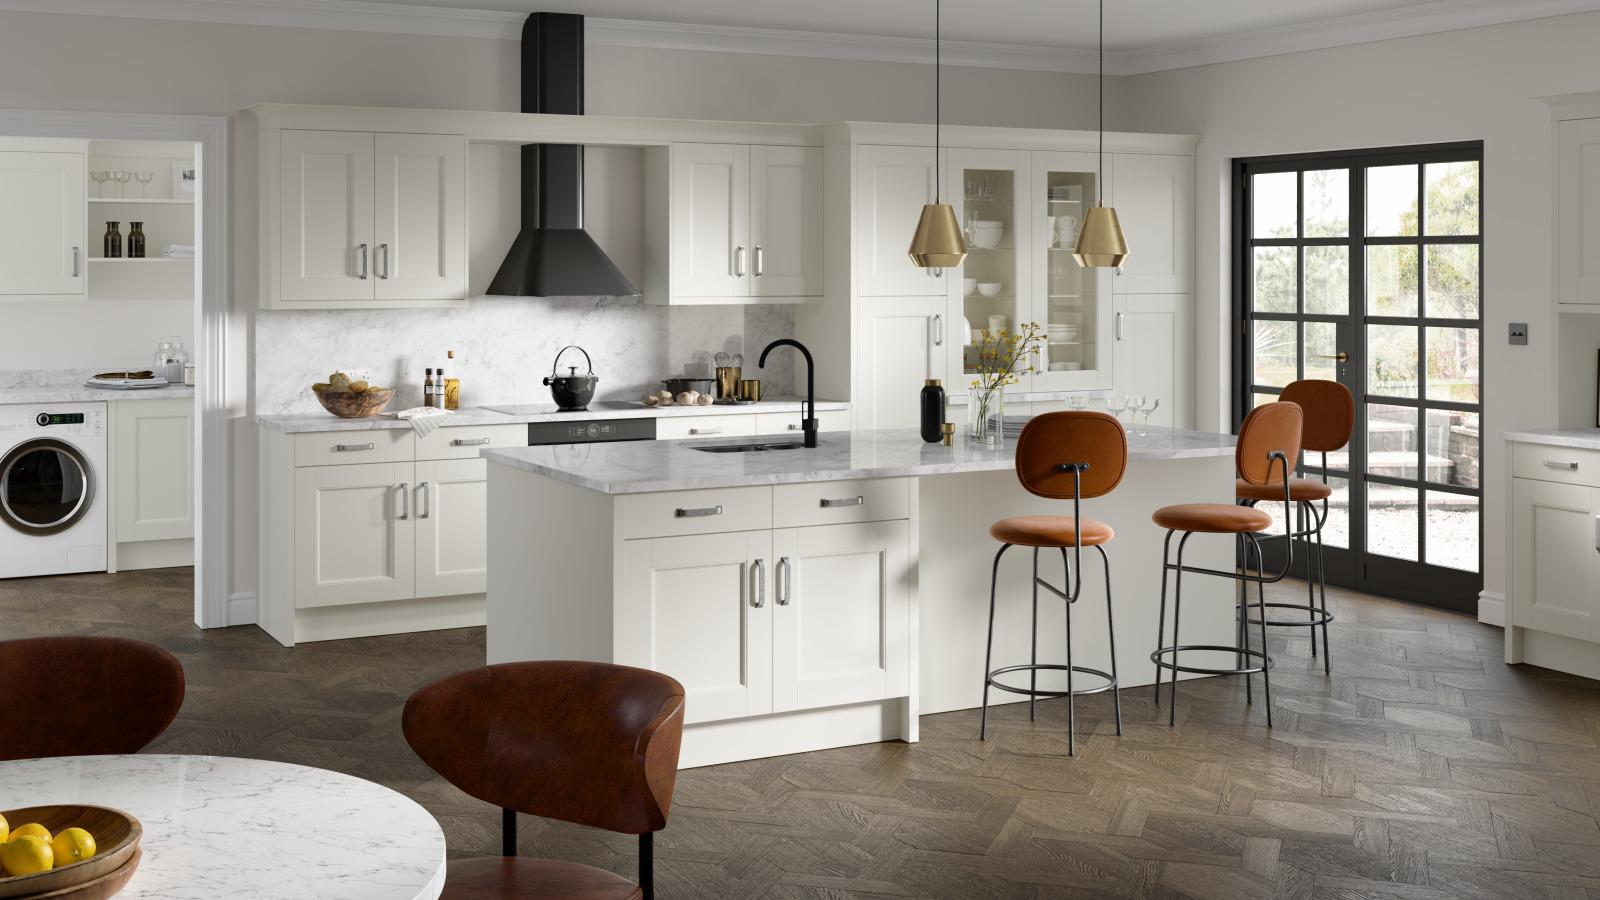 Chiipendale Abbey Kitchen